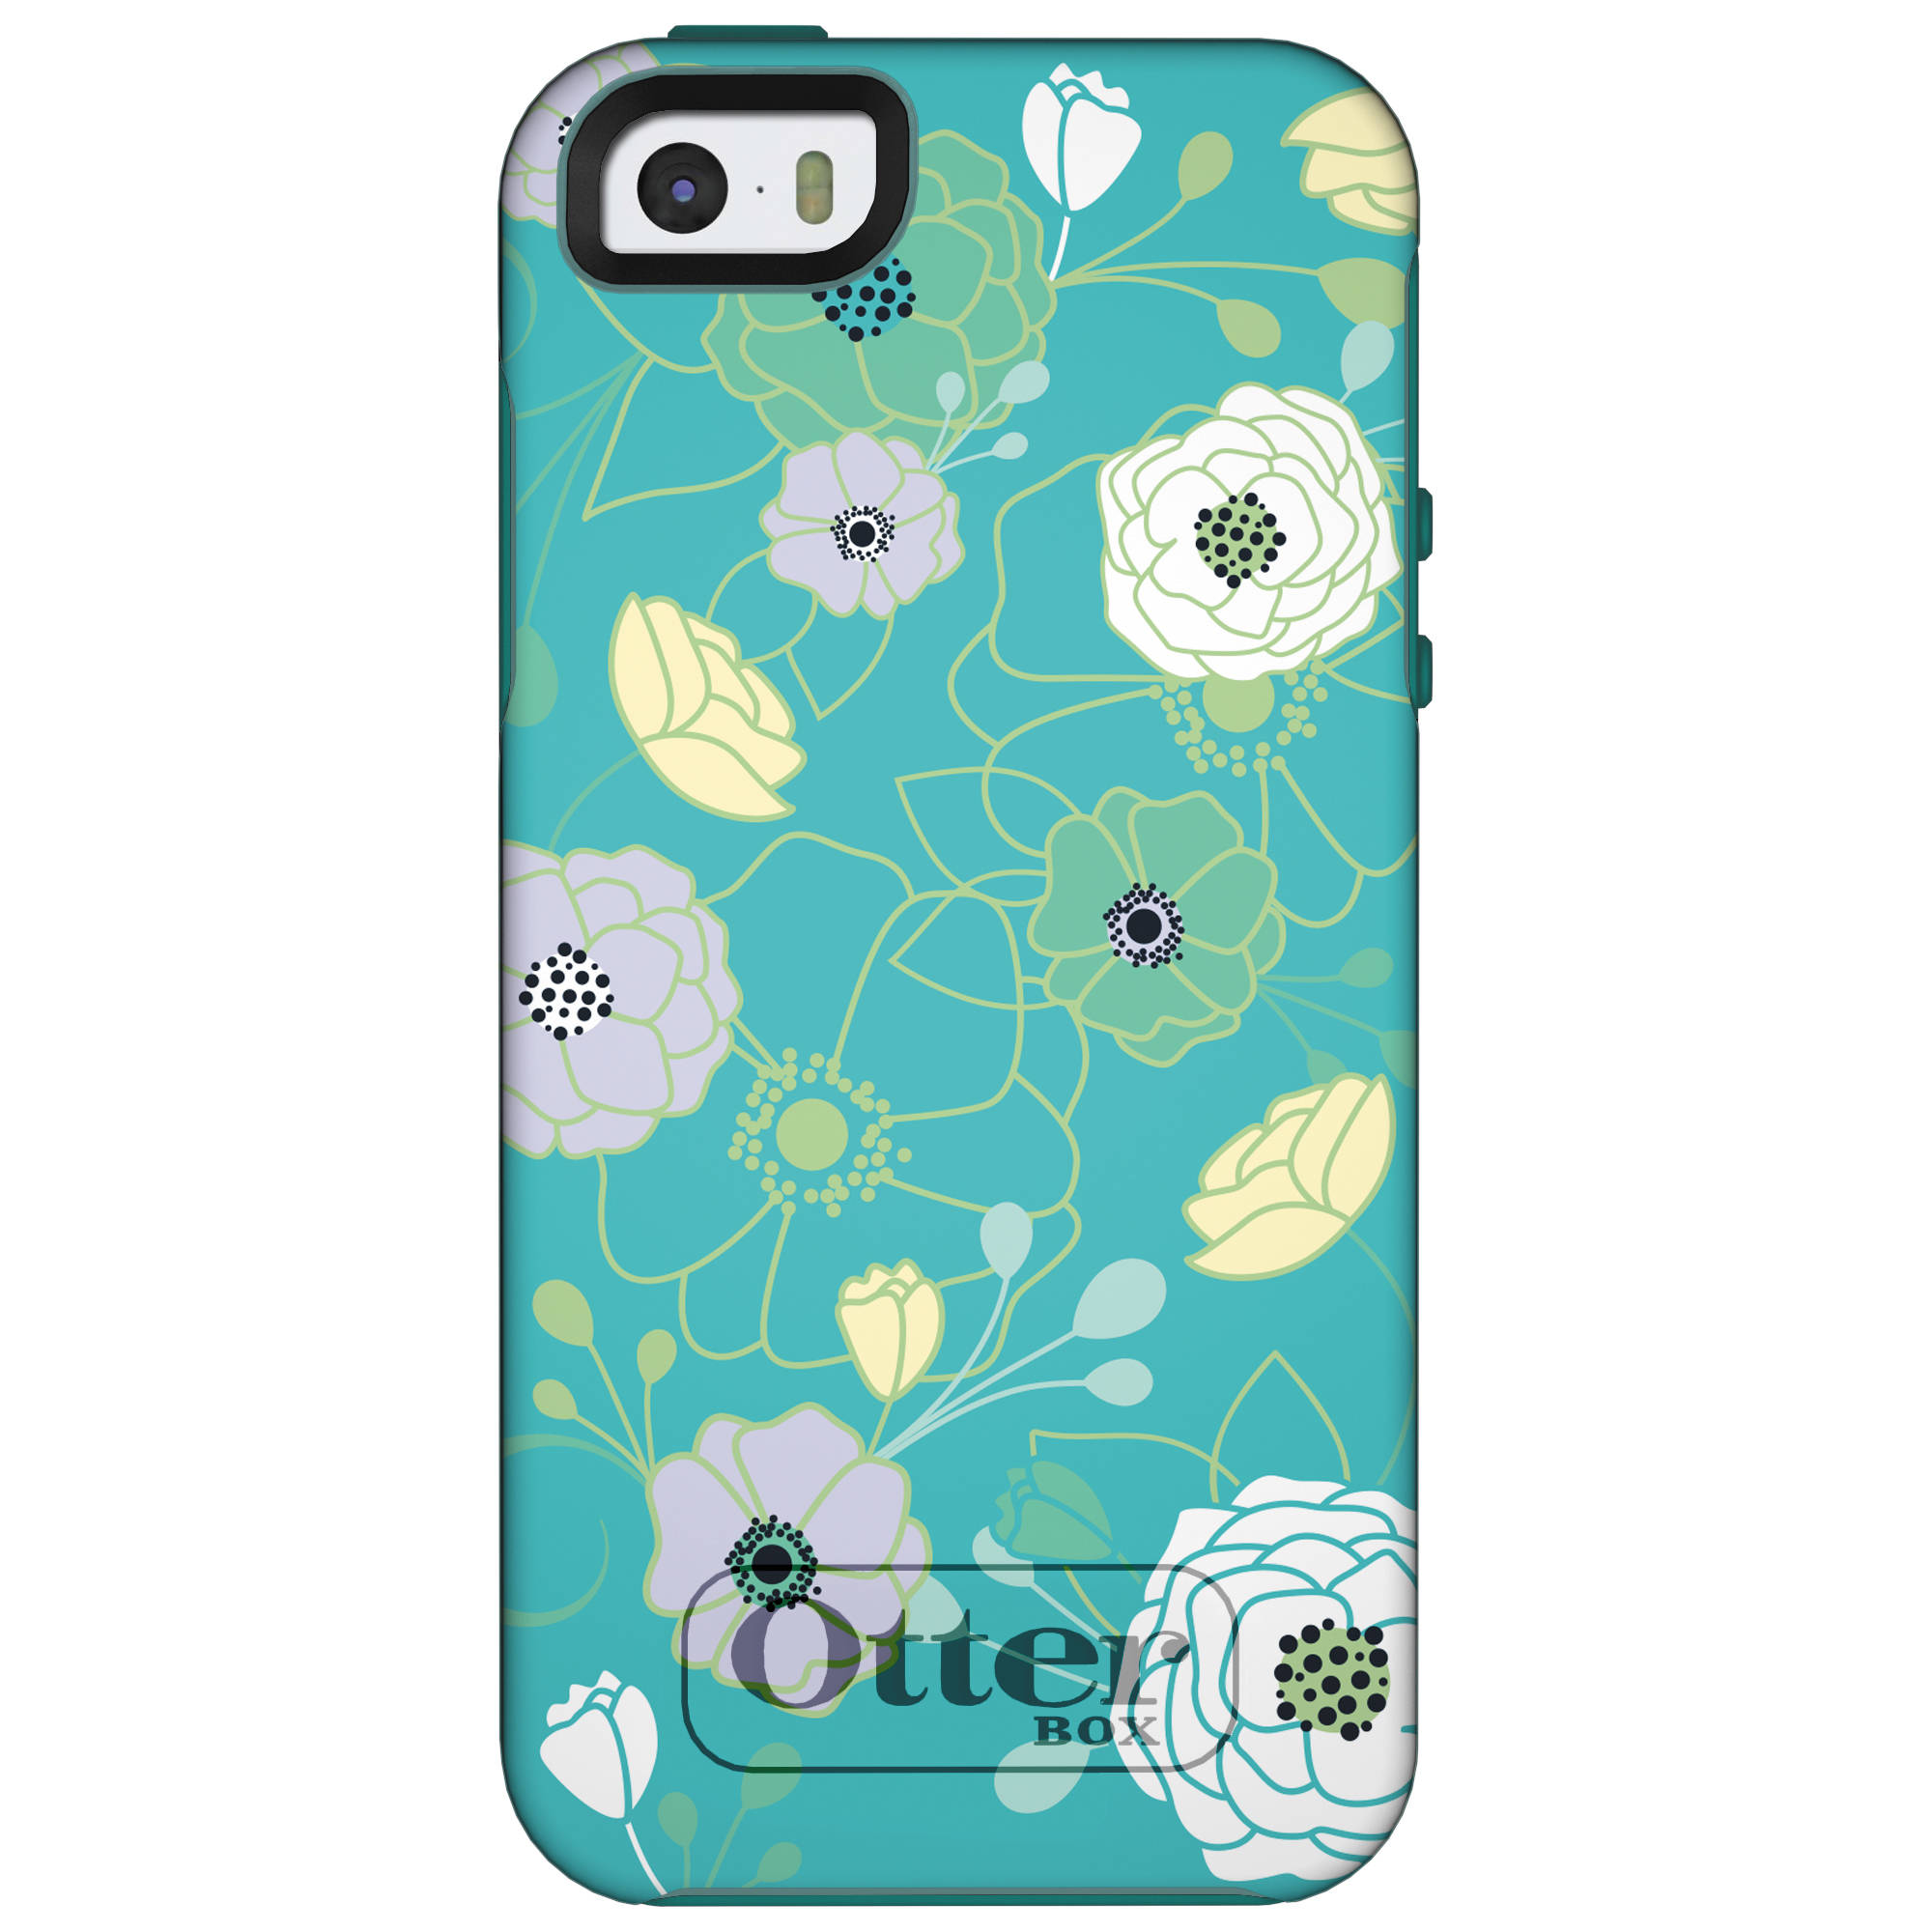 huge discount 28ef2 4d08c OtterBox Symmetry Series Case for iPhone 5/5s/SE (Eden Teal)